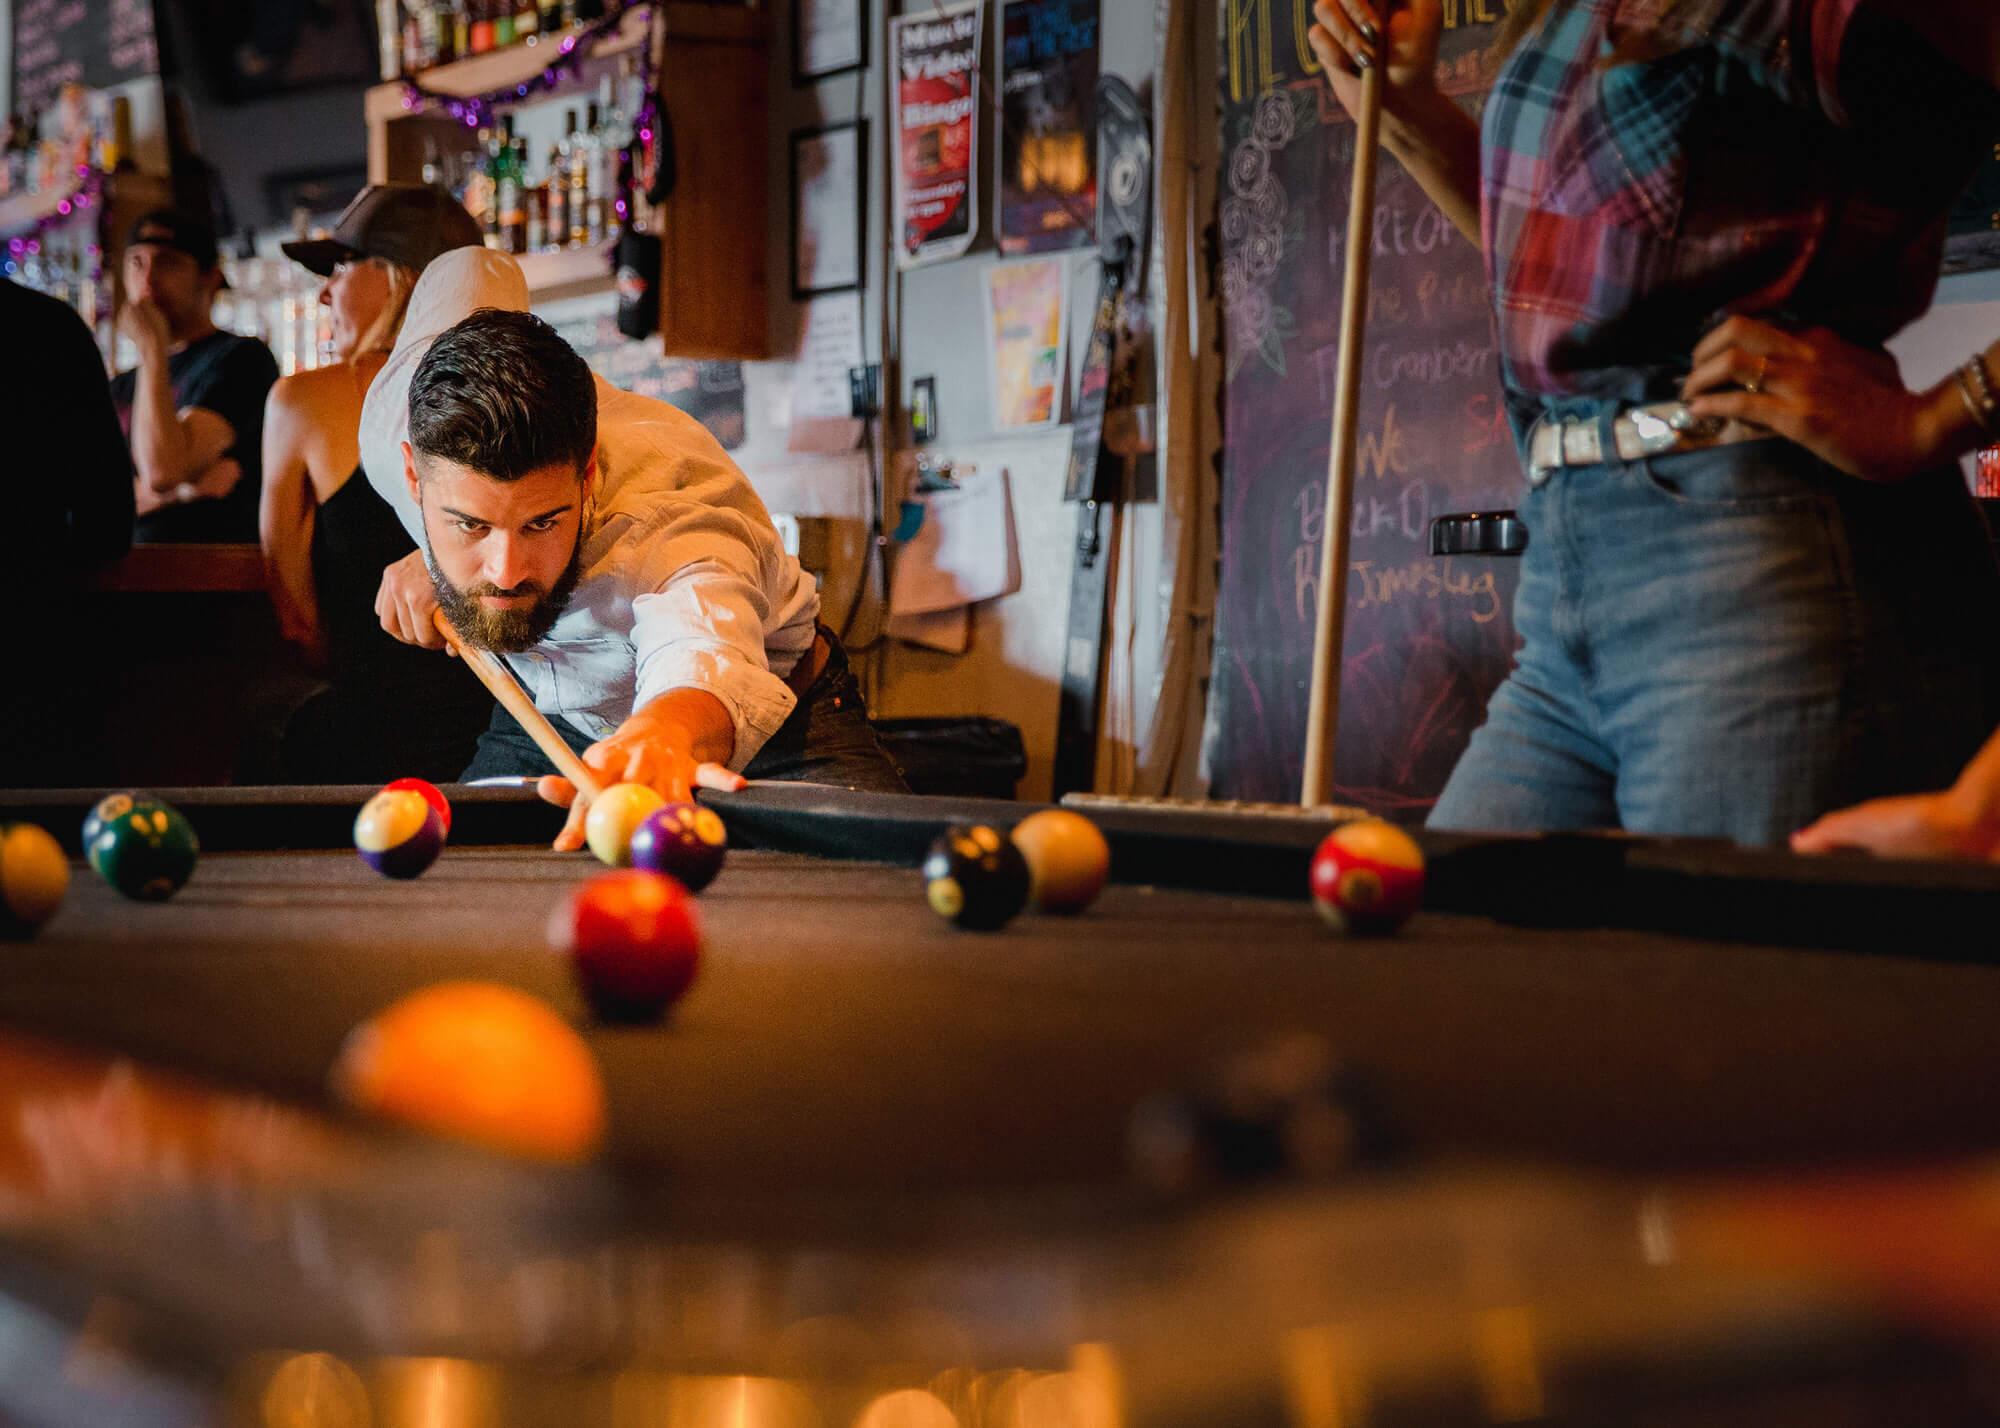 Man playing billiards in bar